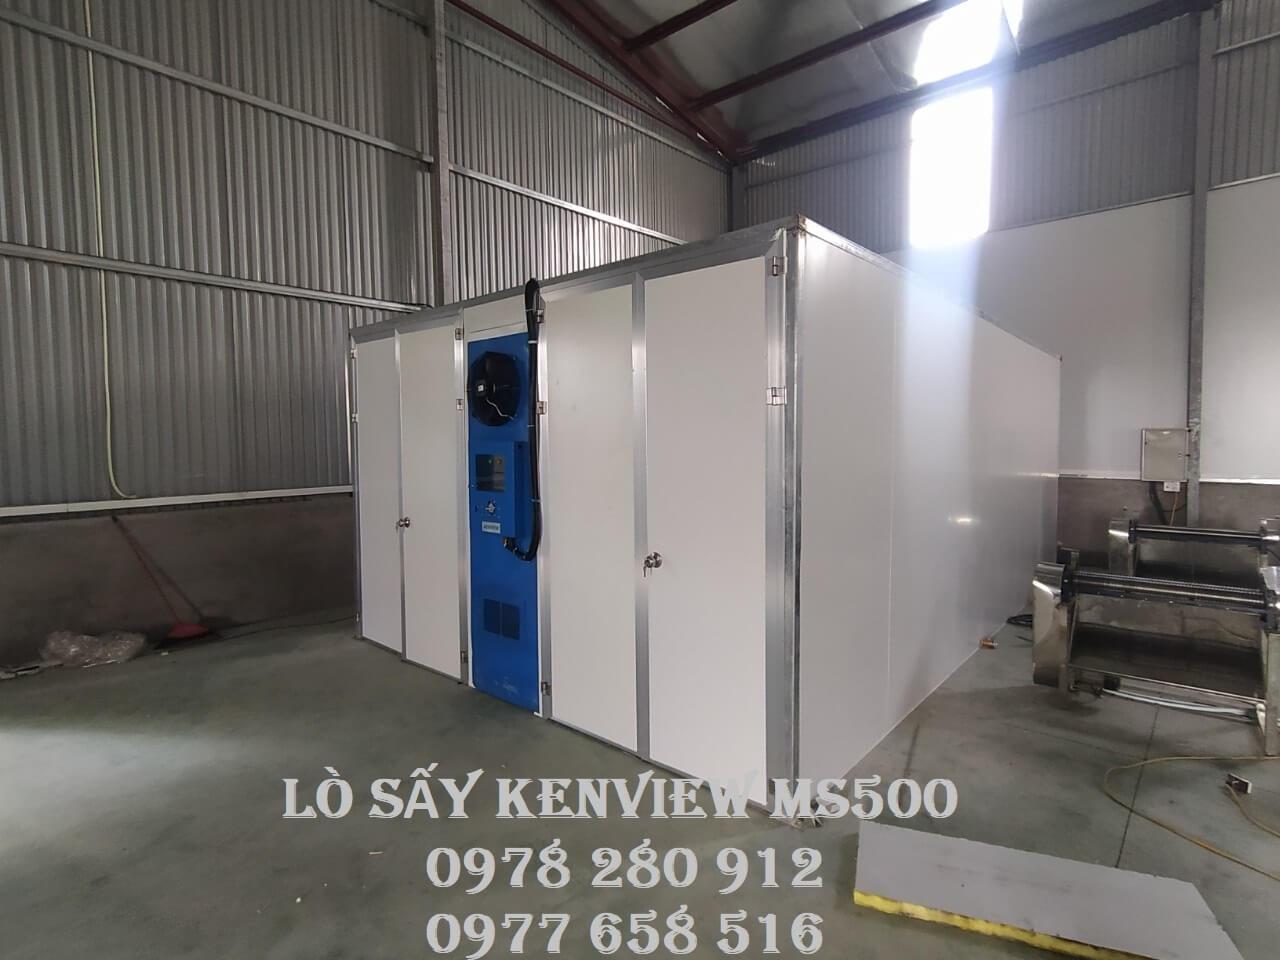 Máy sấy Kenview MS500